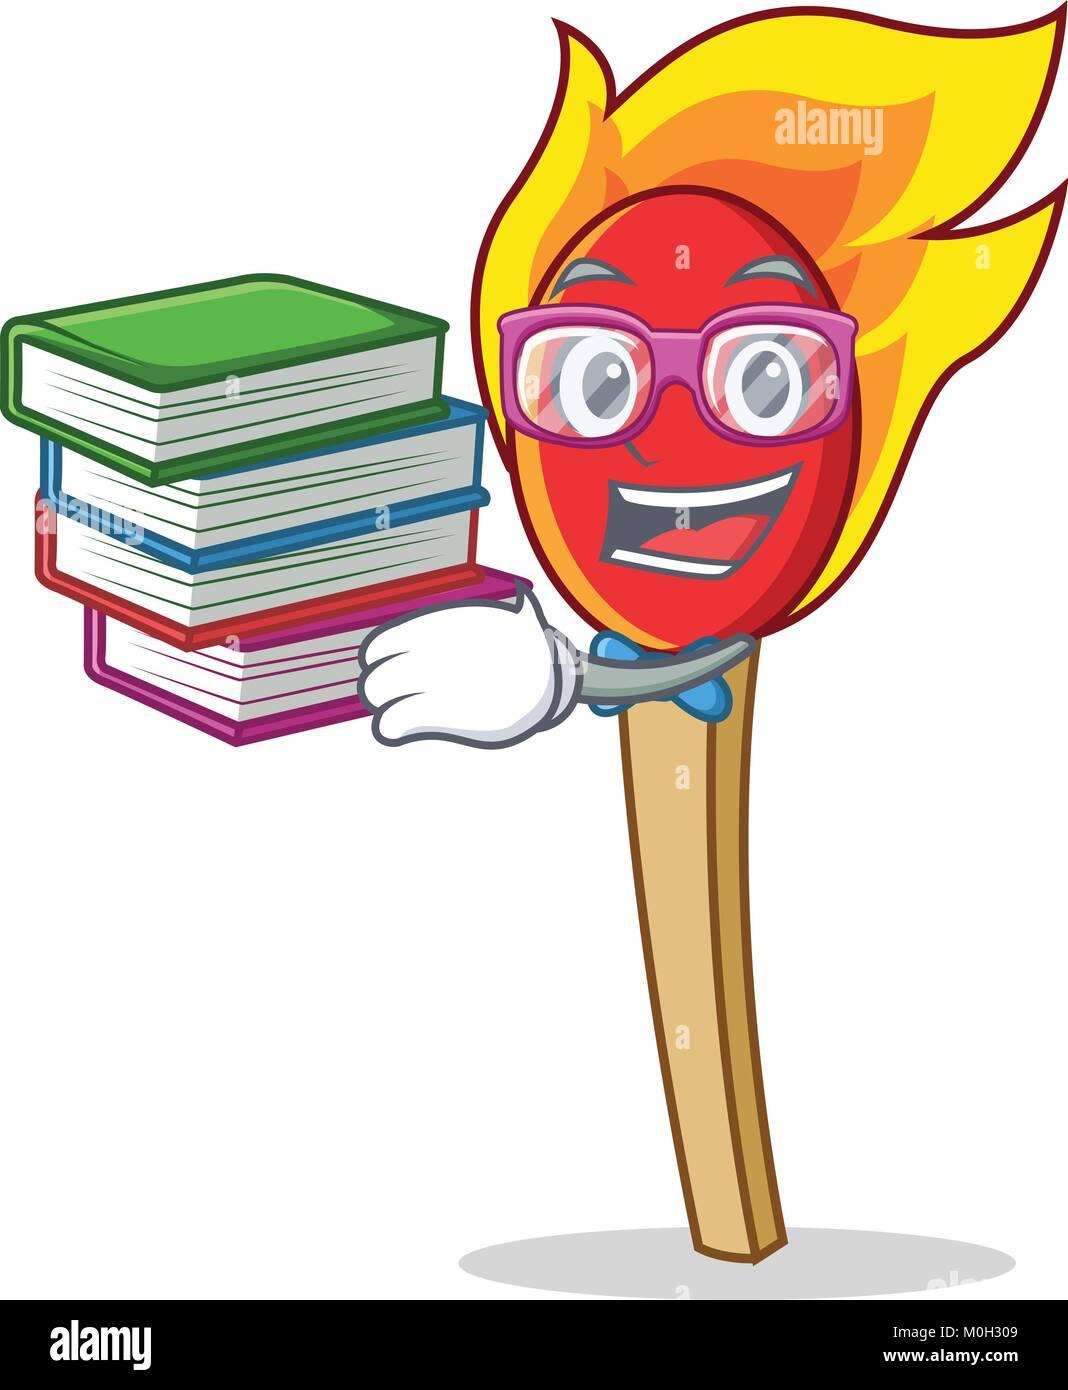 Student with book match stick mascot cartoon - Stock Image